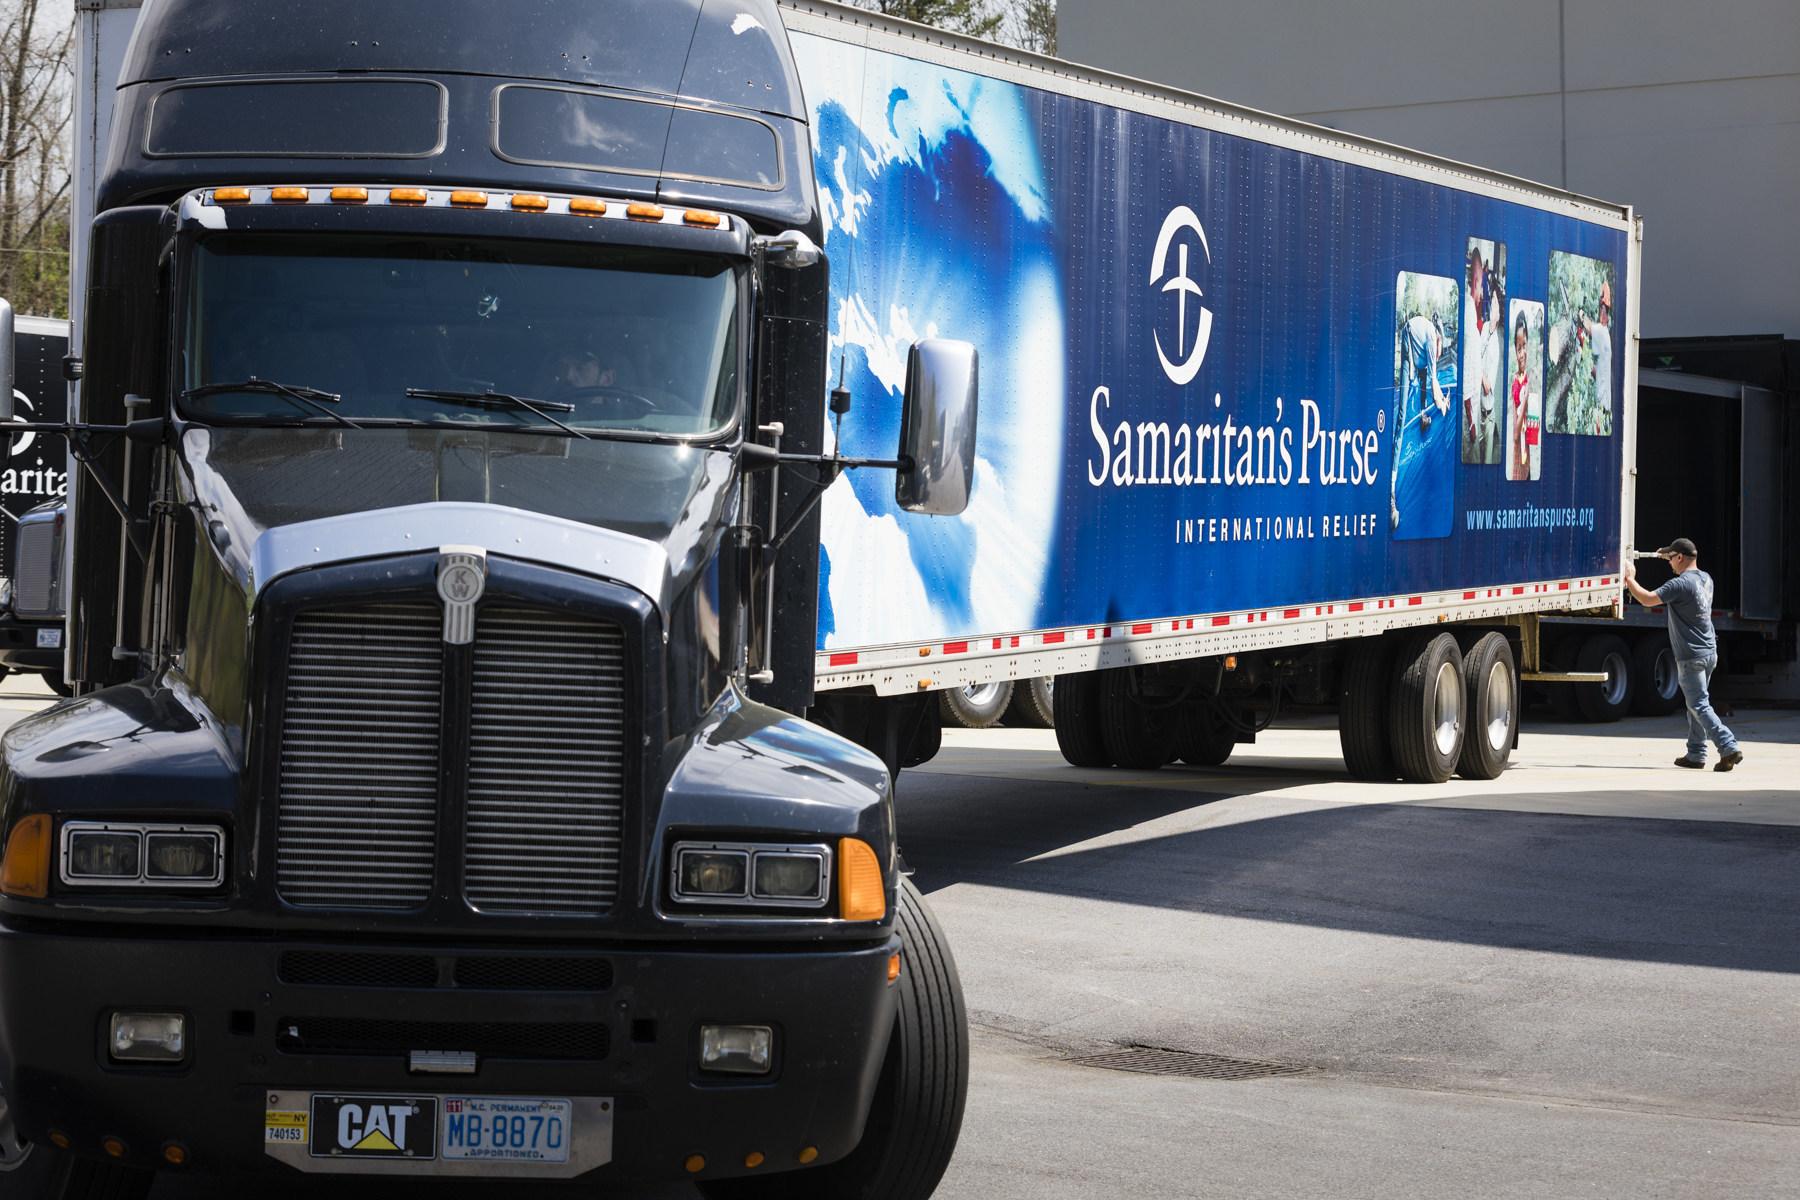 Samaritan's Purse Deploys Emergency Field Hospital to New York City; Adding Life-Saving Medical Surge Capacity